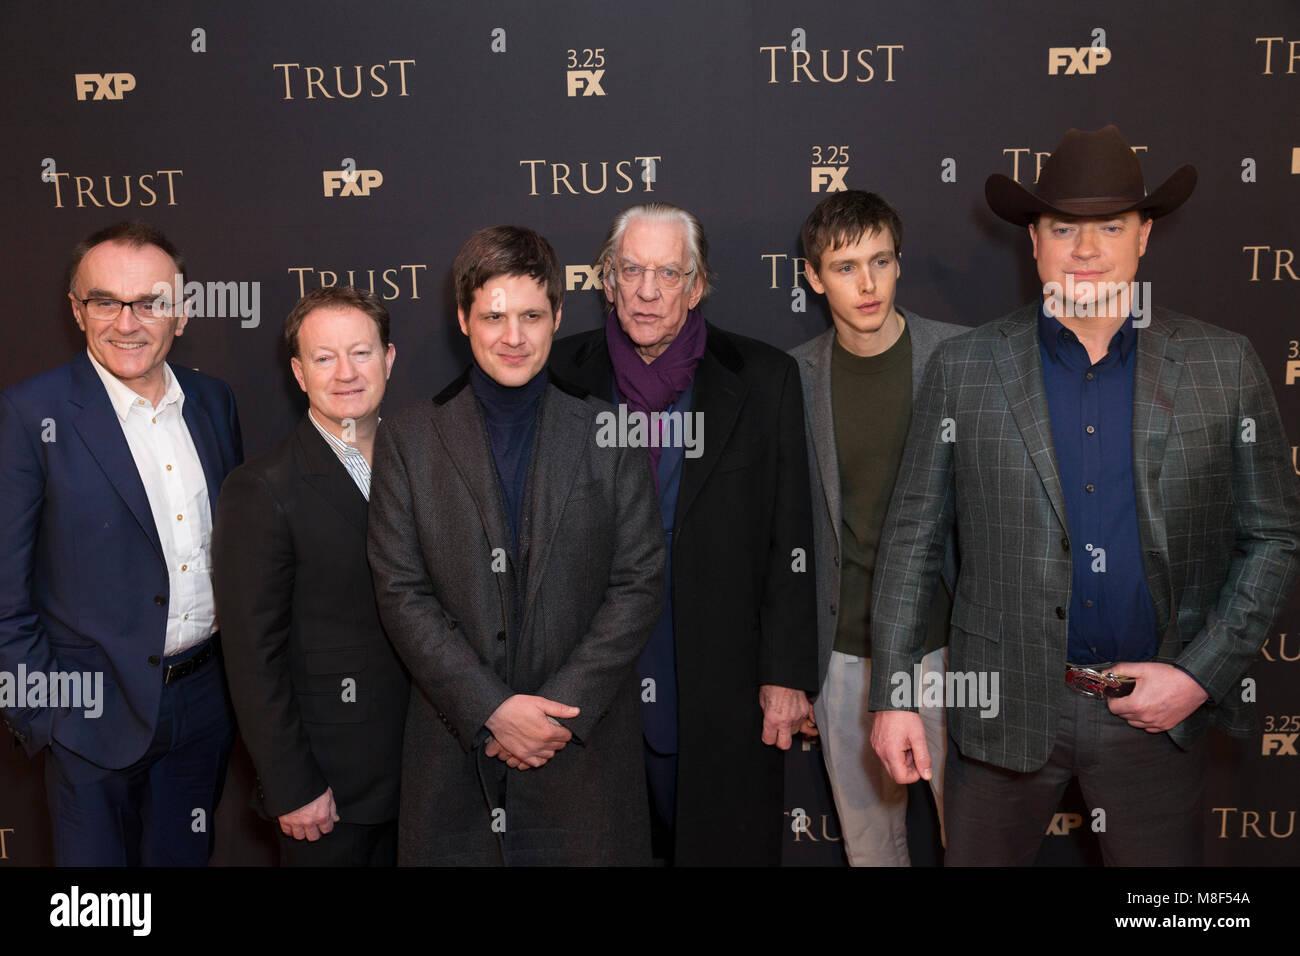 New York, NY - 15. März 2018: Danny Boyle, Simon Beaufoy, Michael Esper, Donald Sutherland, Harris Dickinson, Stockbild